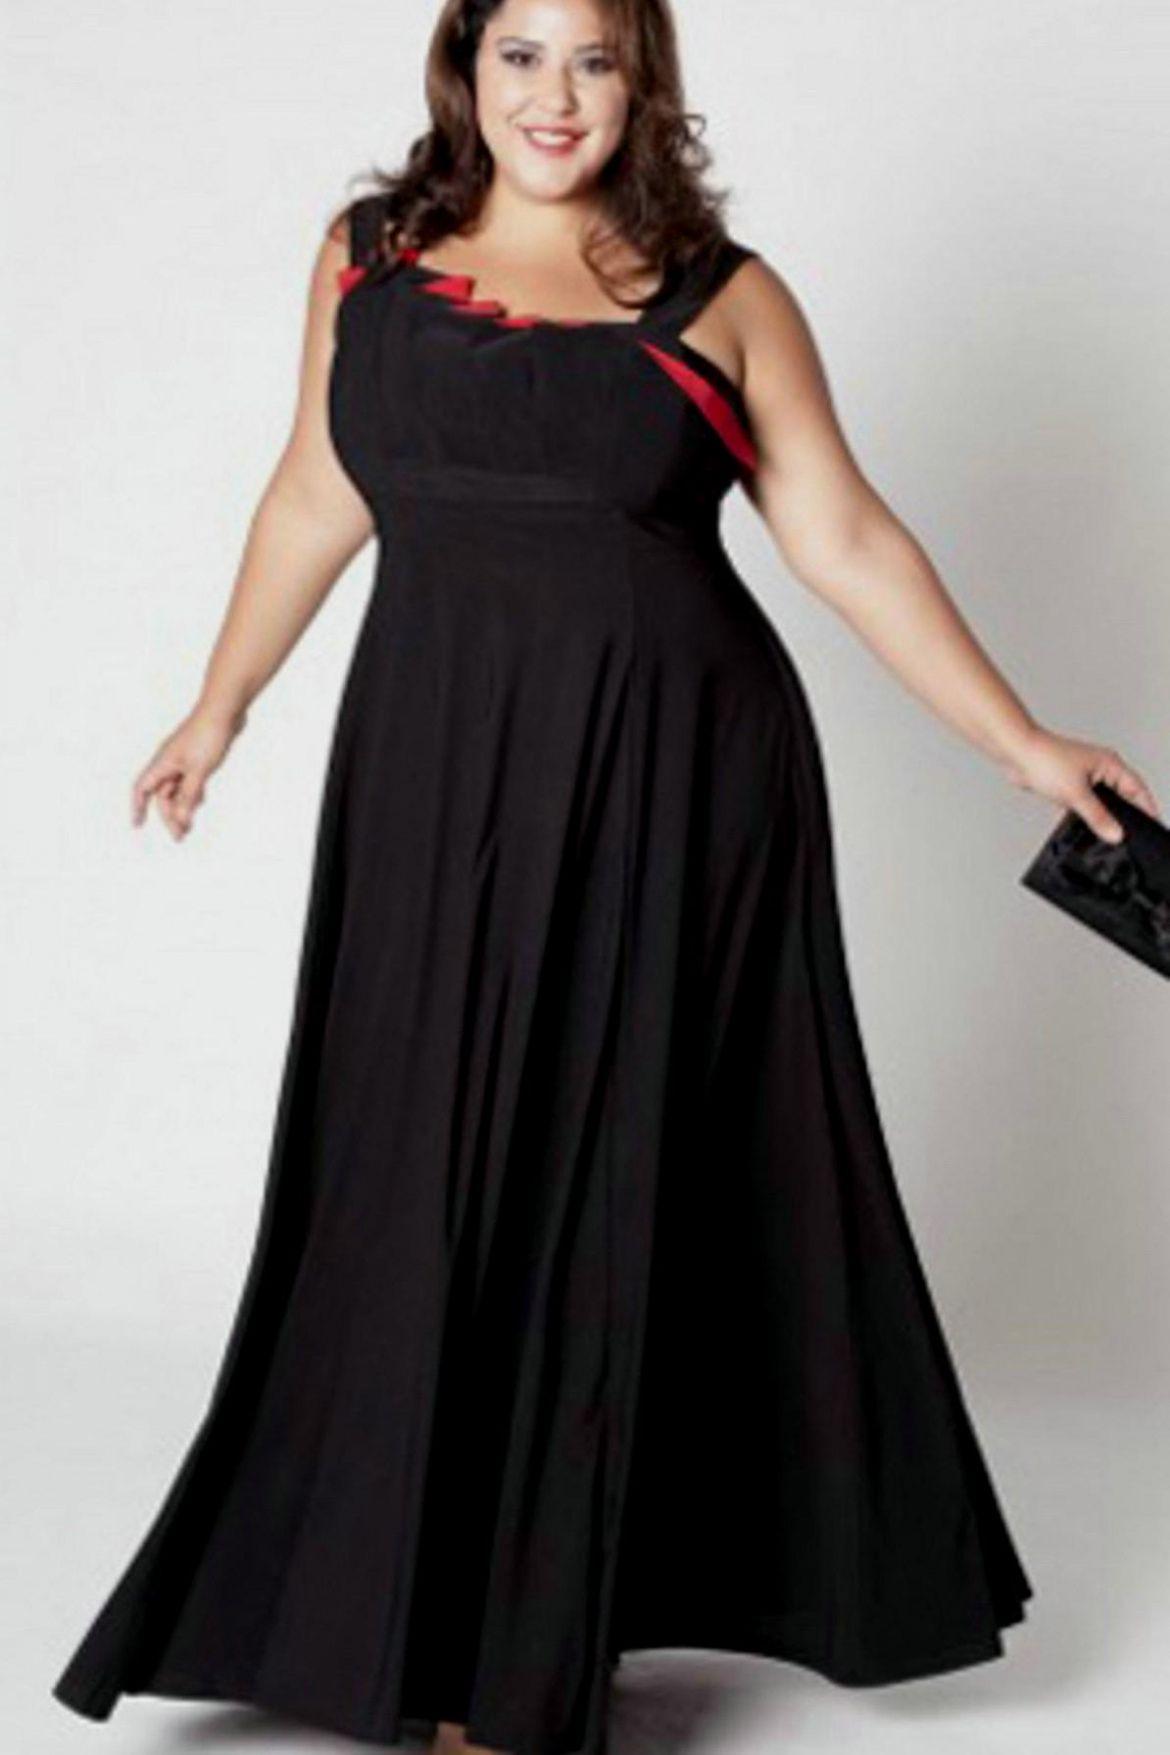 20+ Black Plus Size Wedding Dresses - Dresses for Wedding Reception ...